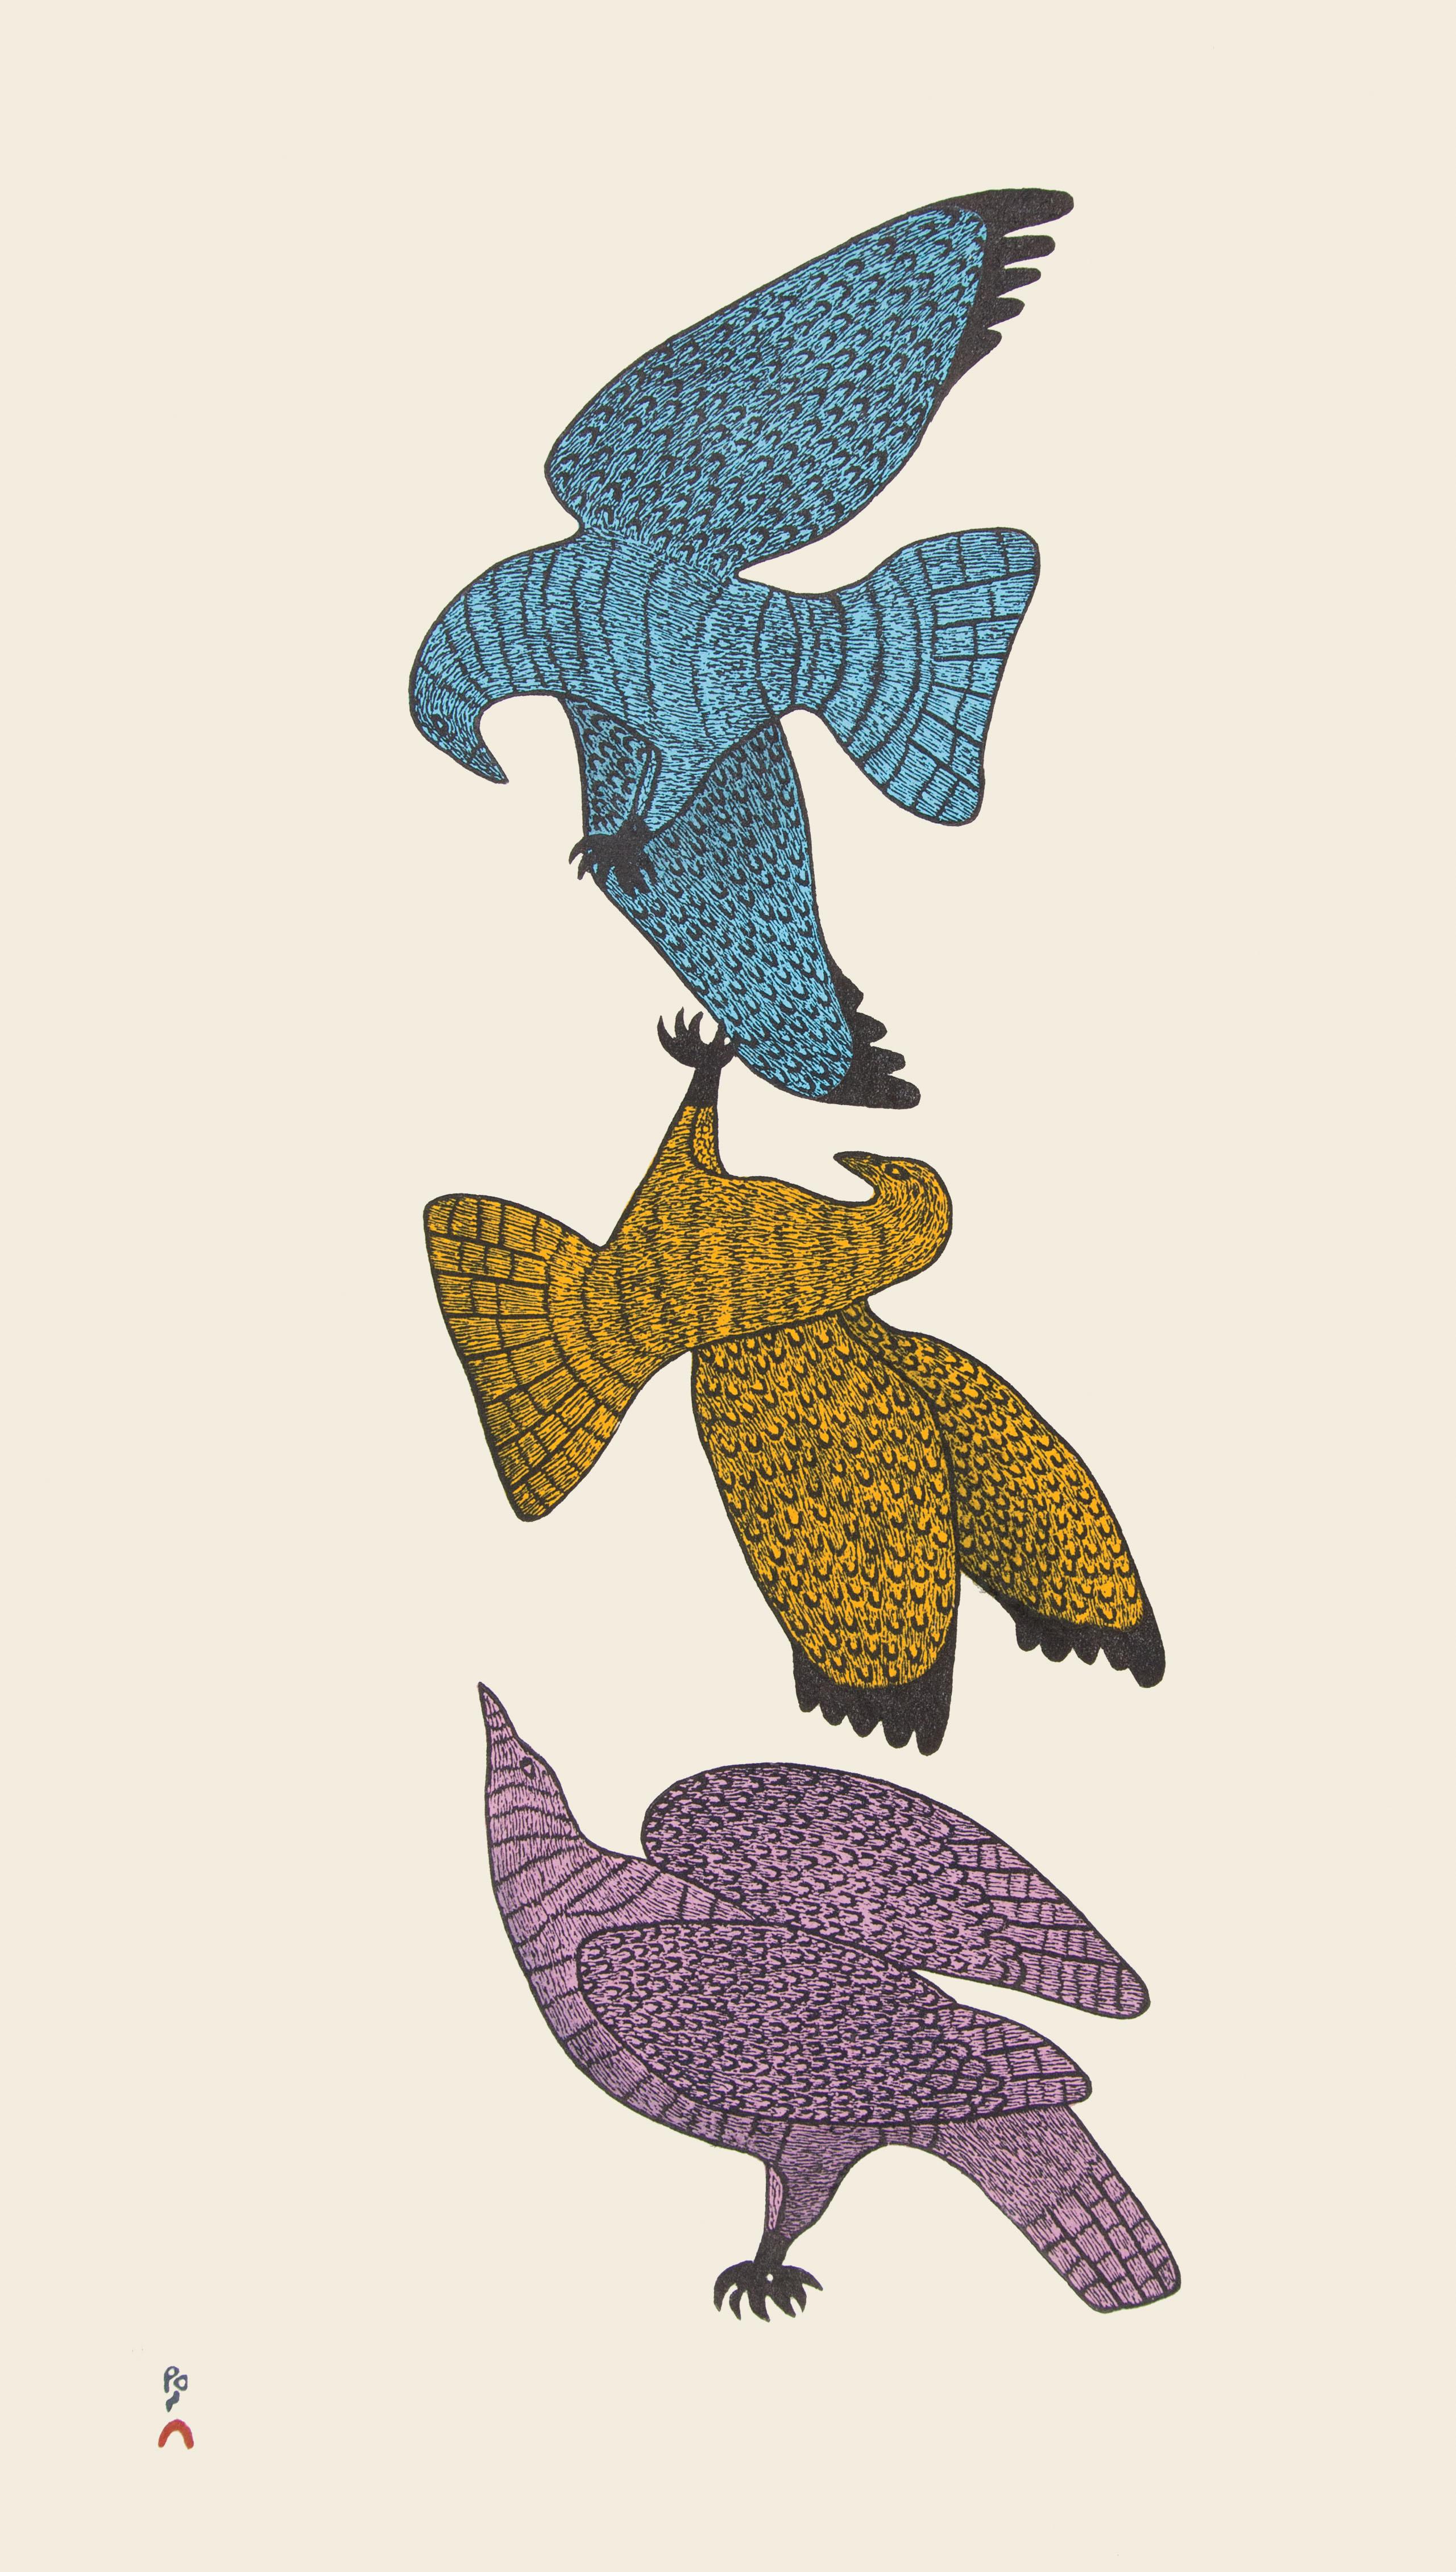 QUVIANAQTUK PUDLAT Aerial Courtship Stonecut Printer: Qiatsuk Niviaqsi 62 x 35.3 cm; 24 1/2 x 14 in. $560 US